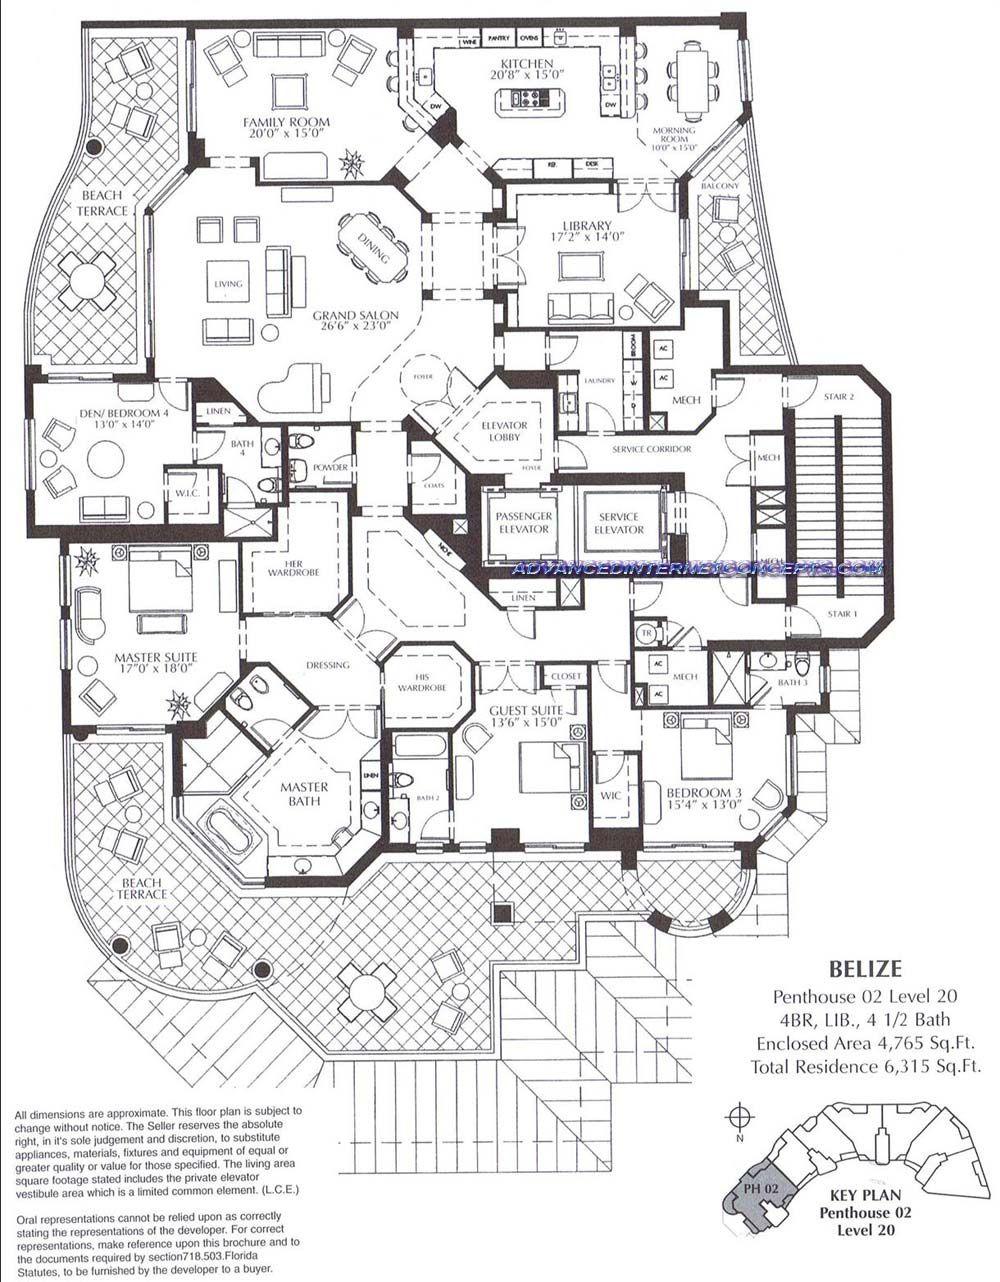 Http Housefm Org Wp Content Uploads 2014 01 Luxury Penthouse Apartment Luxury Penthouse A Condo Floor Plans Penthouse Apartment Floor Plan Luxury Floor Plans